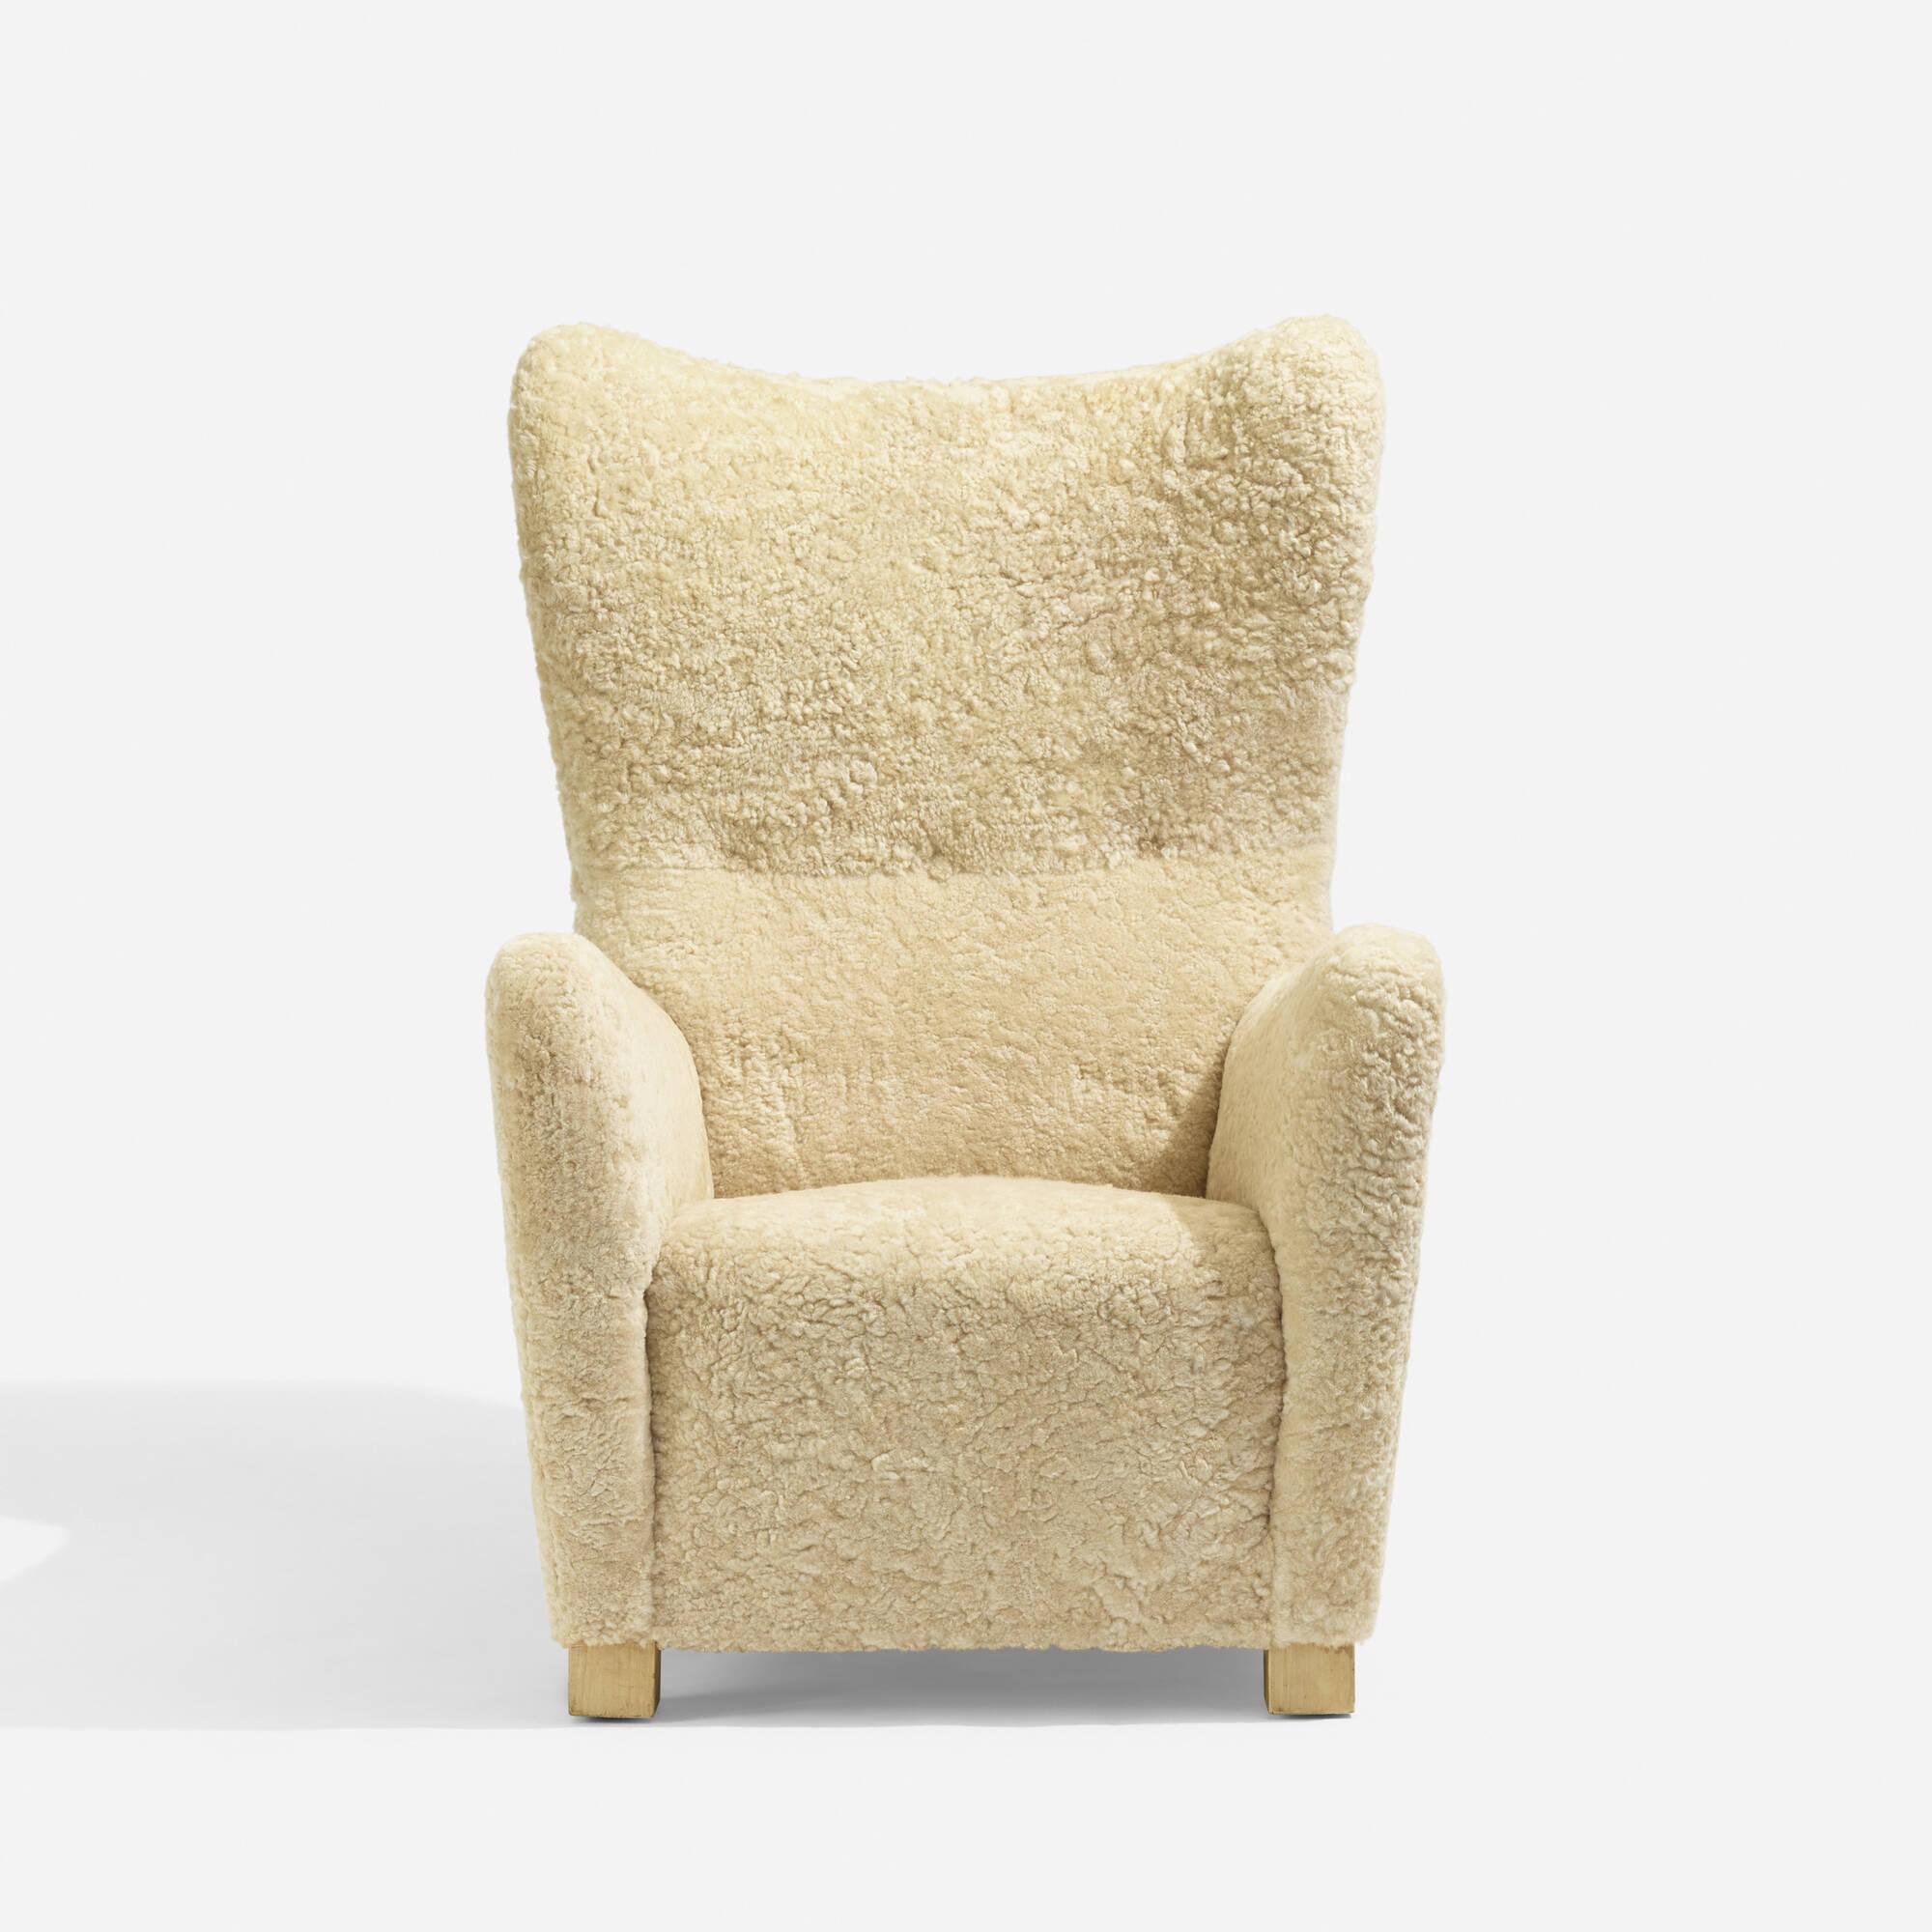 338: Fritz Hansen / Wing Back armchair, model 1672 (1 of 5)